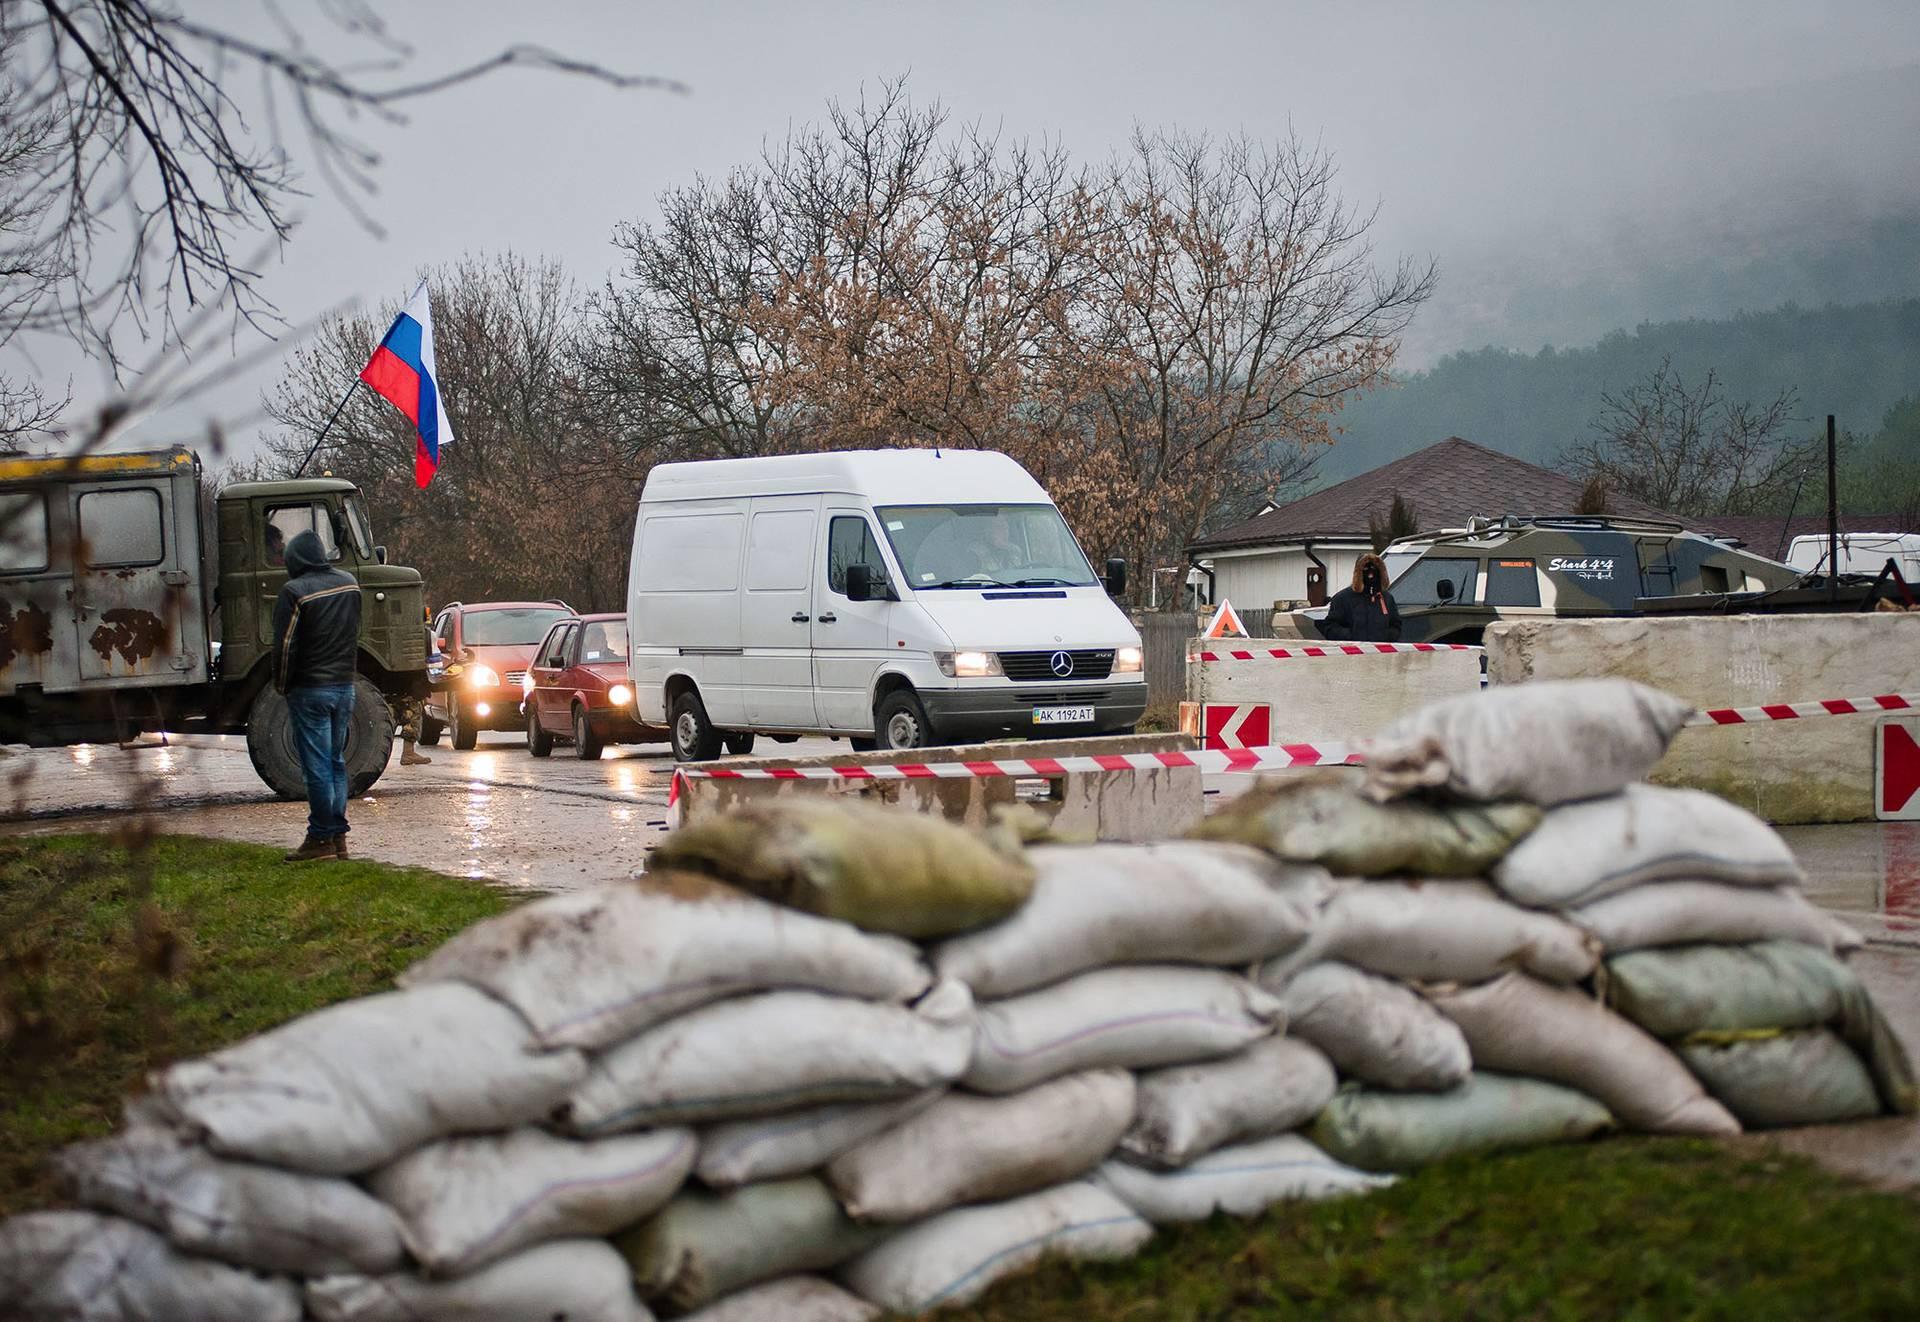 Блокпост на трасі Сімферополь — Севастополь, Крим, Україна, 26 лютого 2014 року